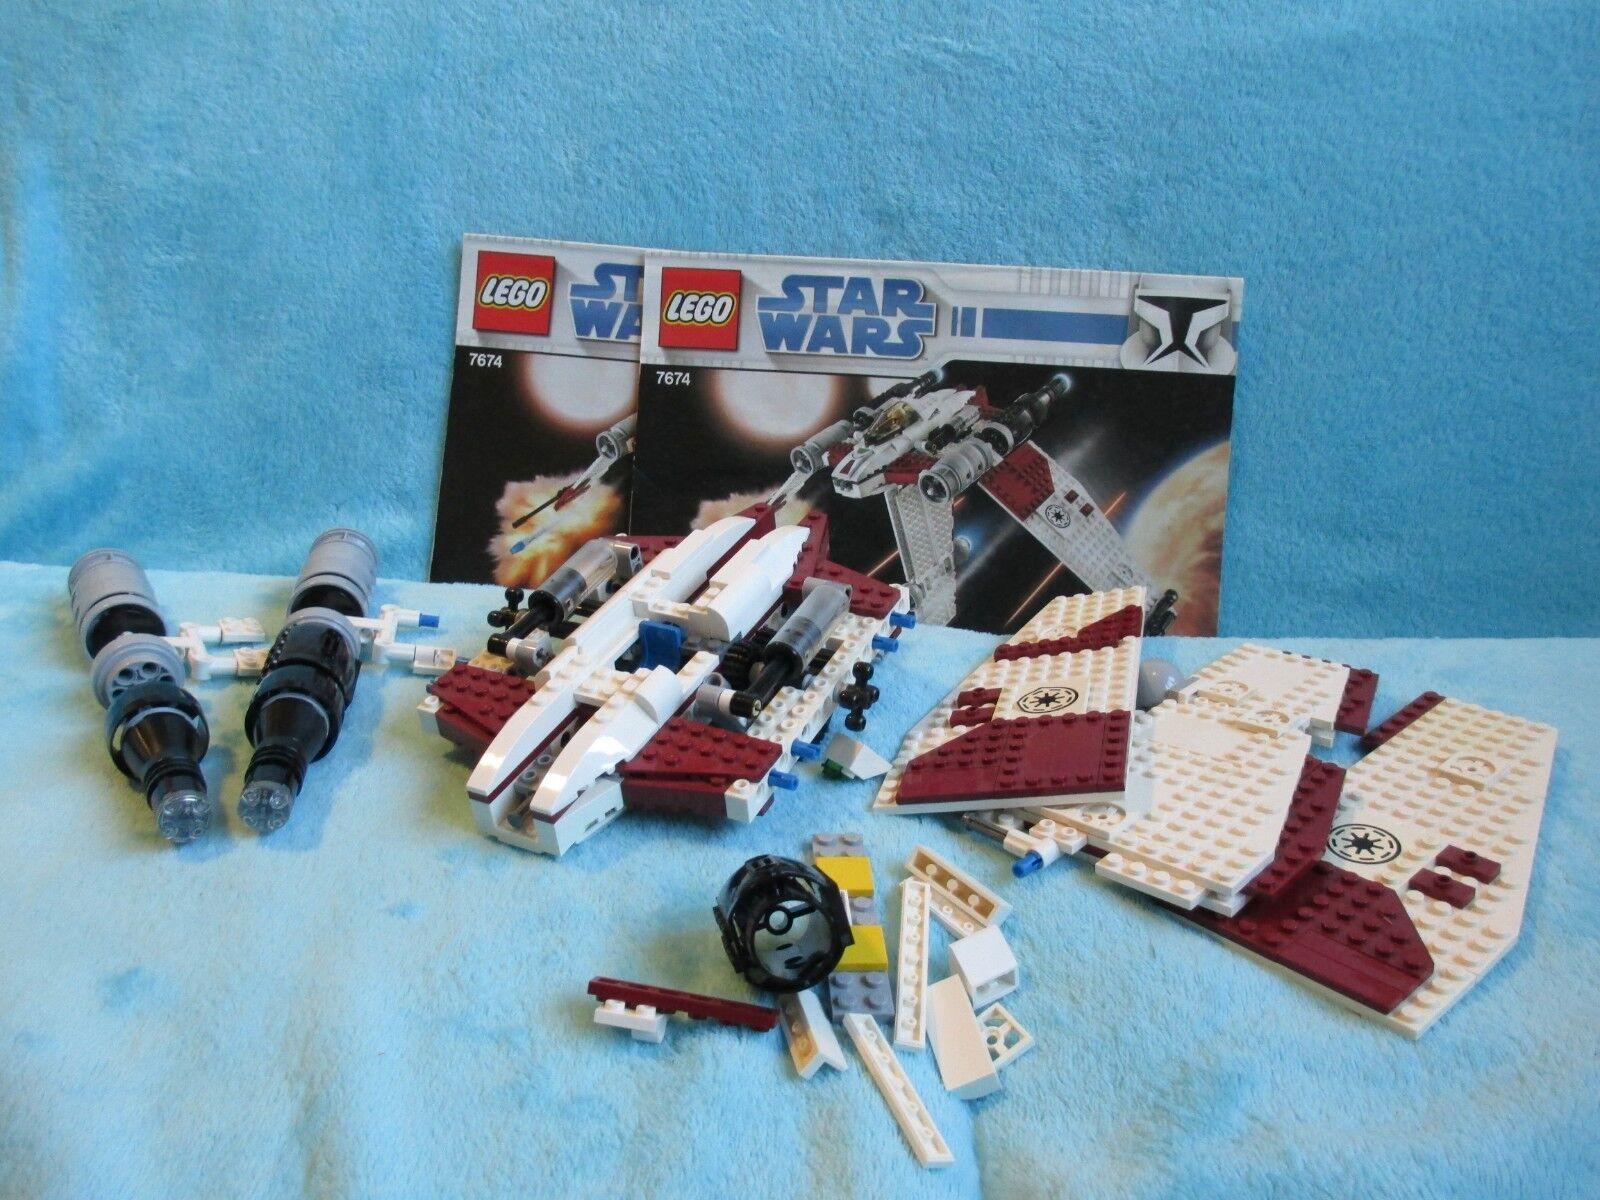 LEGO Star Wars Set 7674 - Clone V-19 Torrent INCOMPLETE + Instructions TMV-19